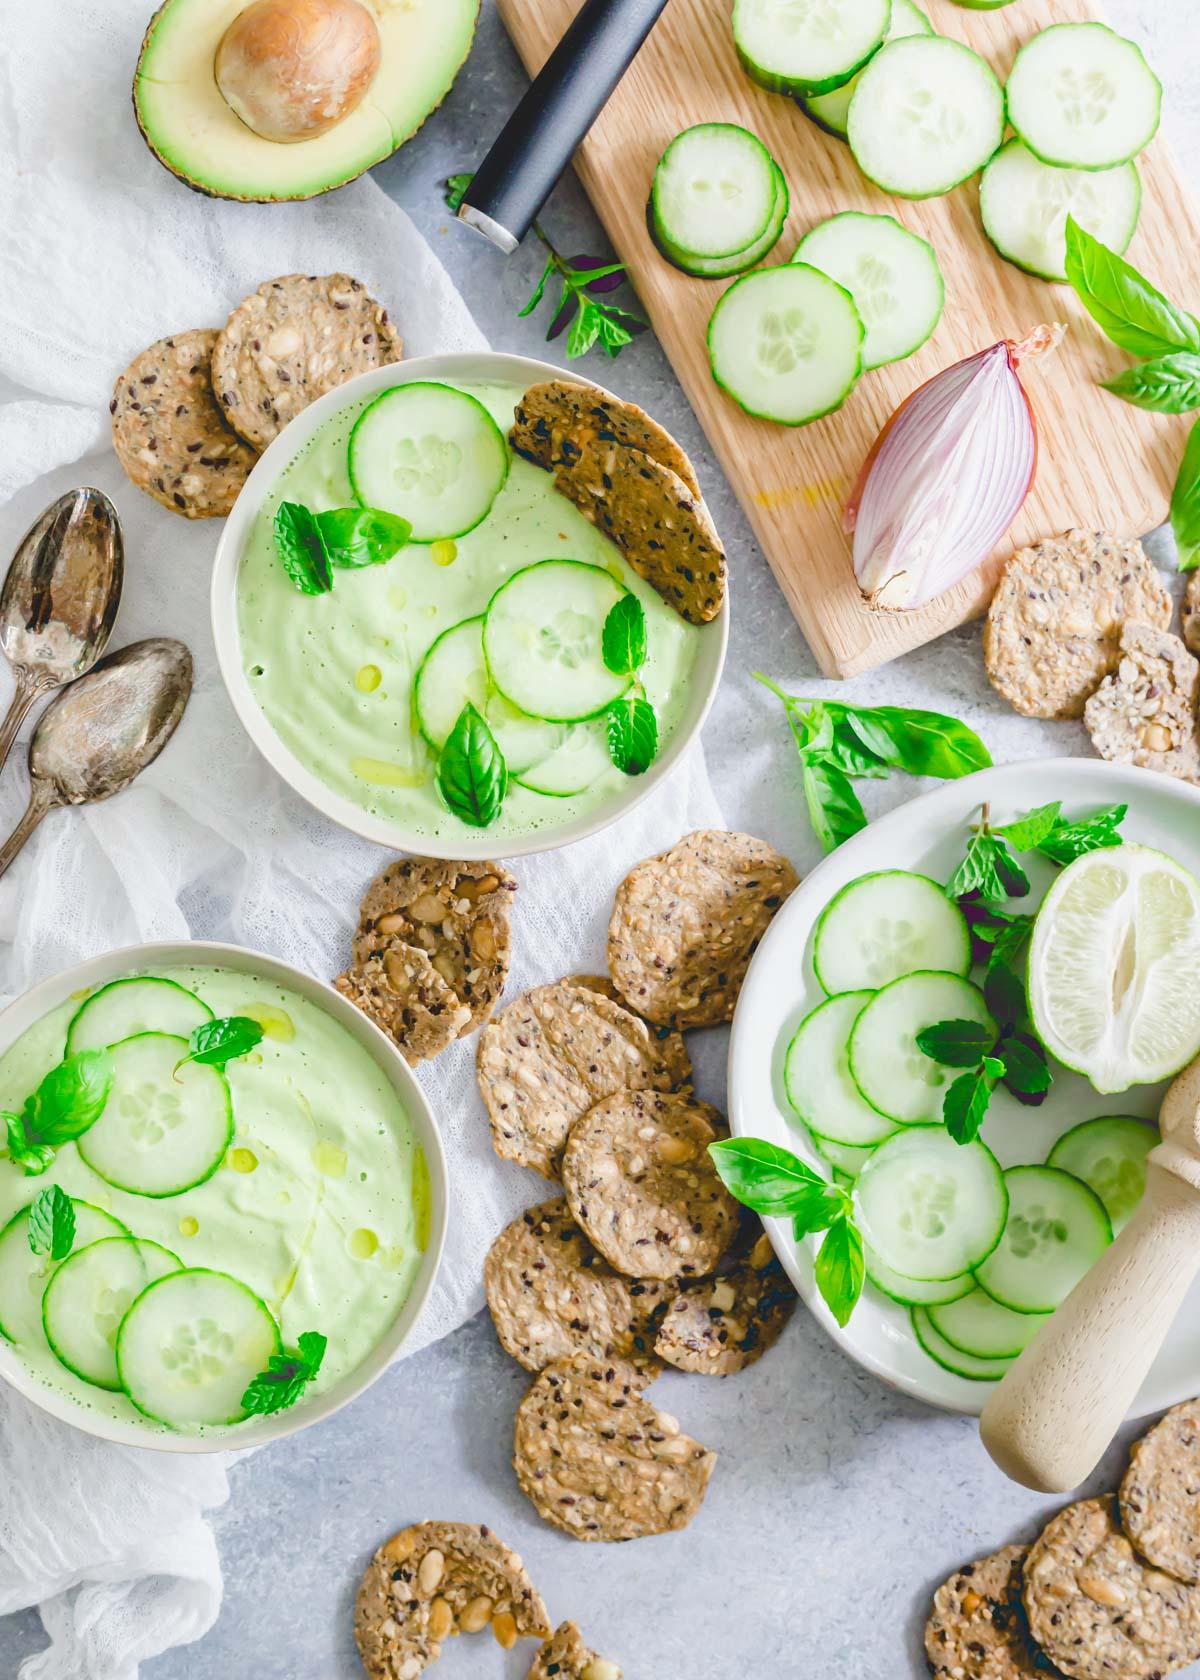 Raw cucumber gazpacho recipe served with gluten-free crackers and fresh herbs.